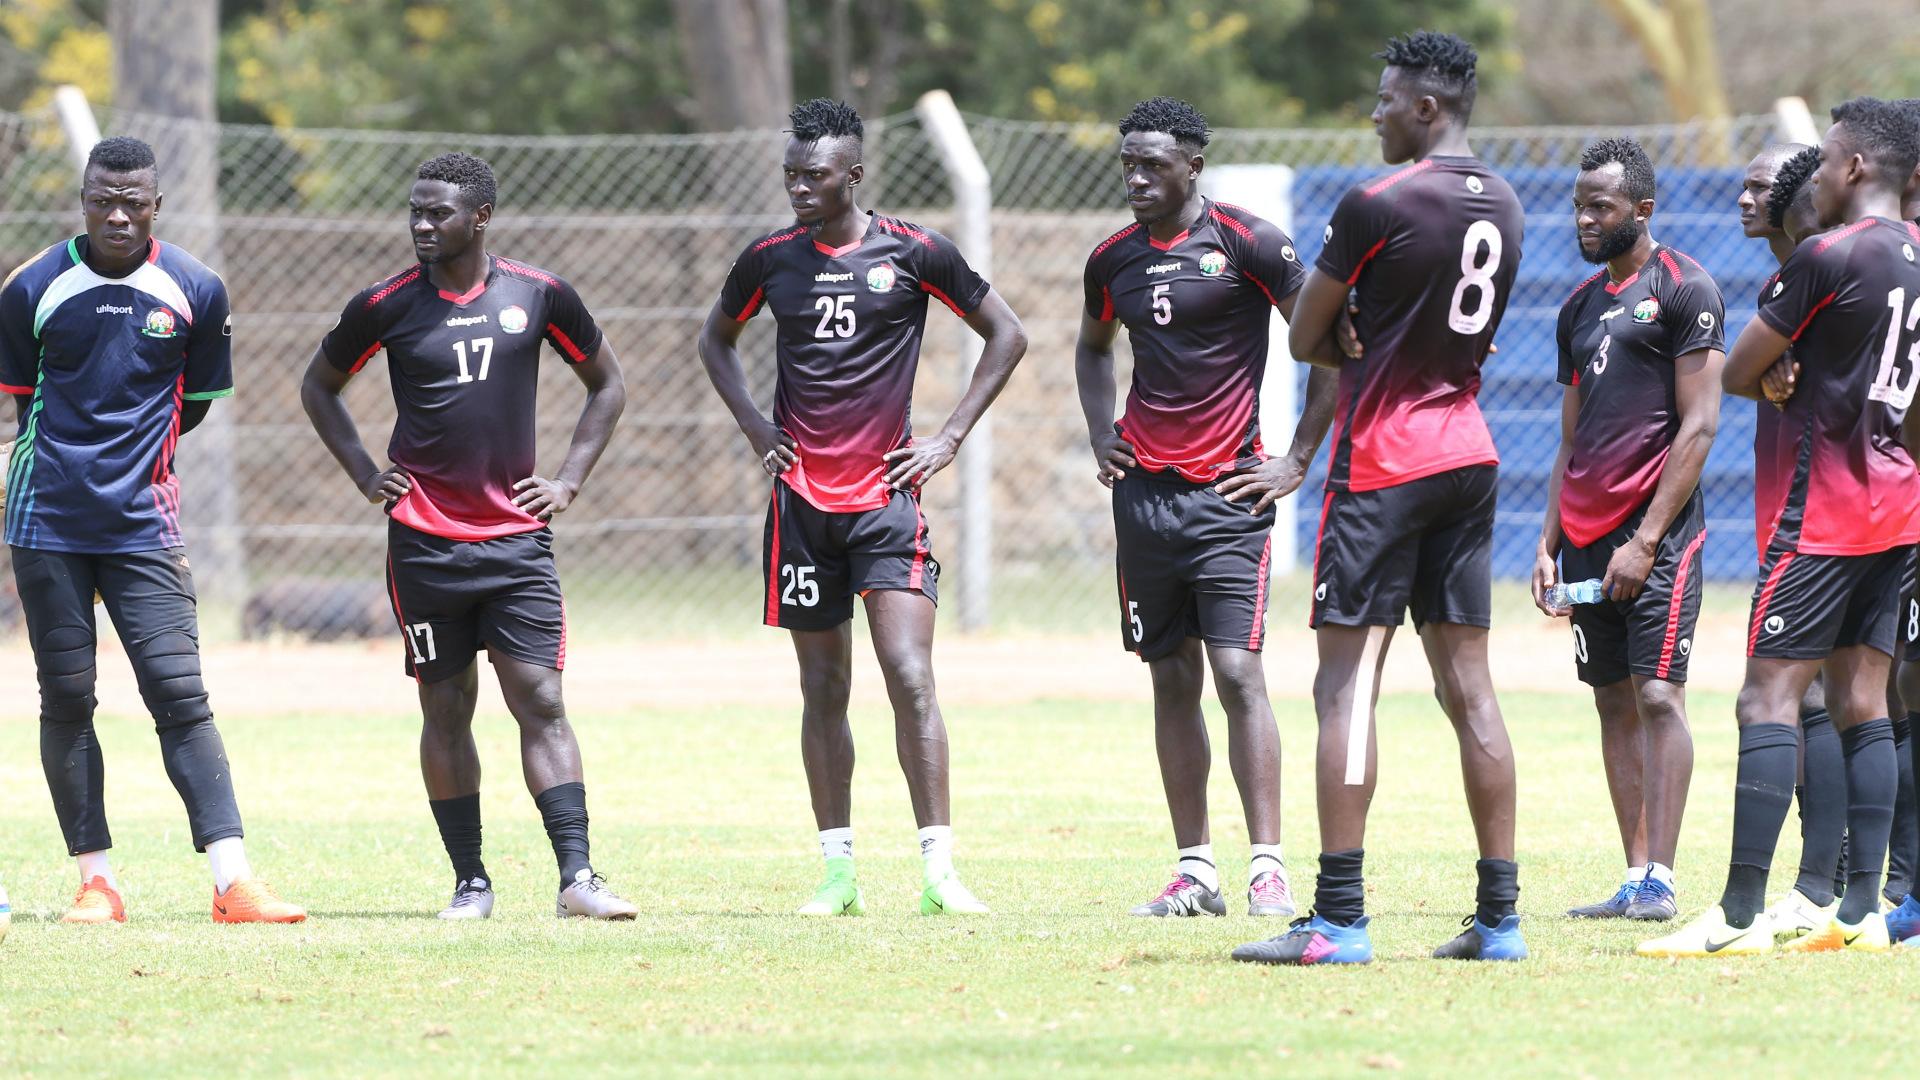 Wanyama, Miheso score as Comoros hold Kenya